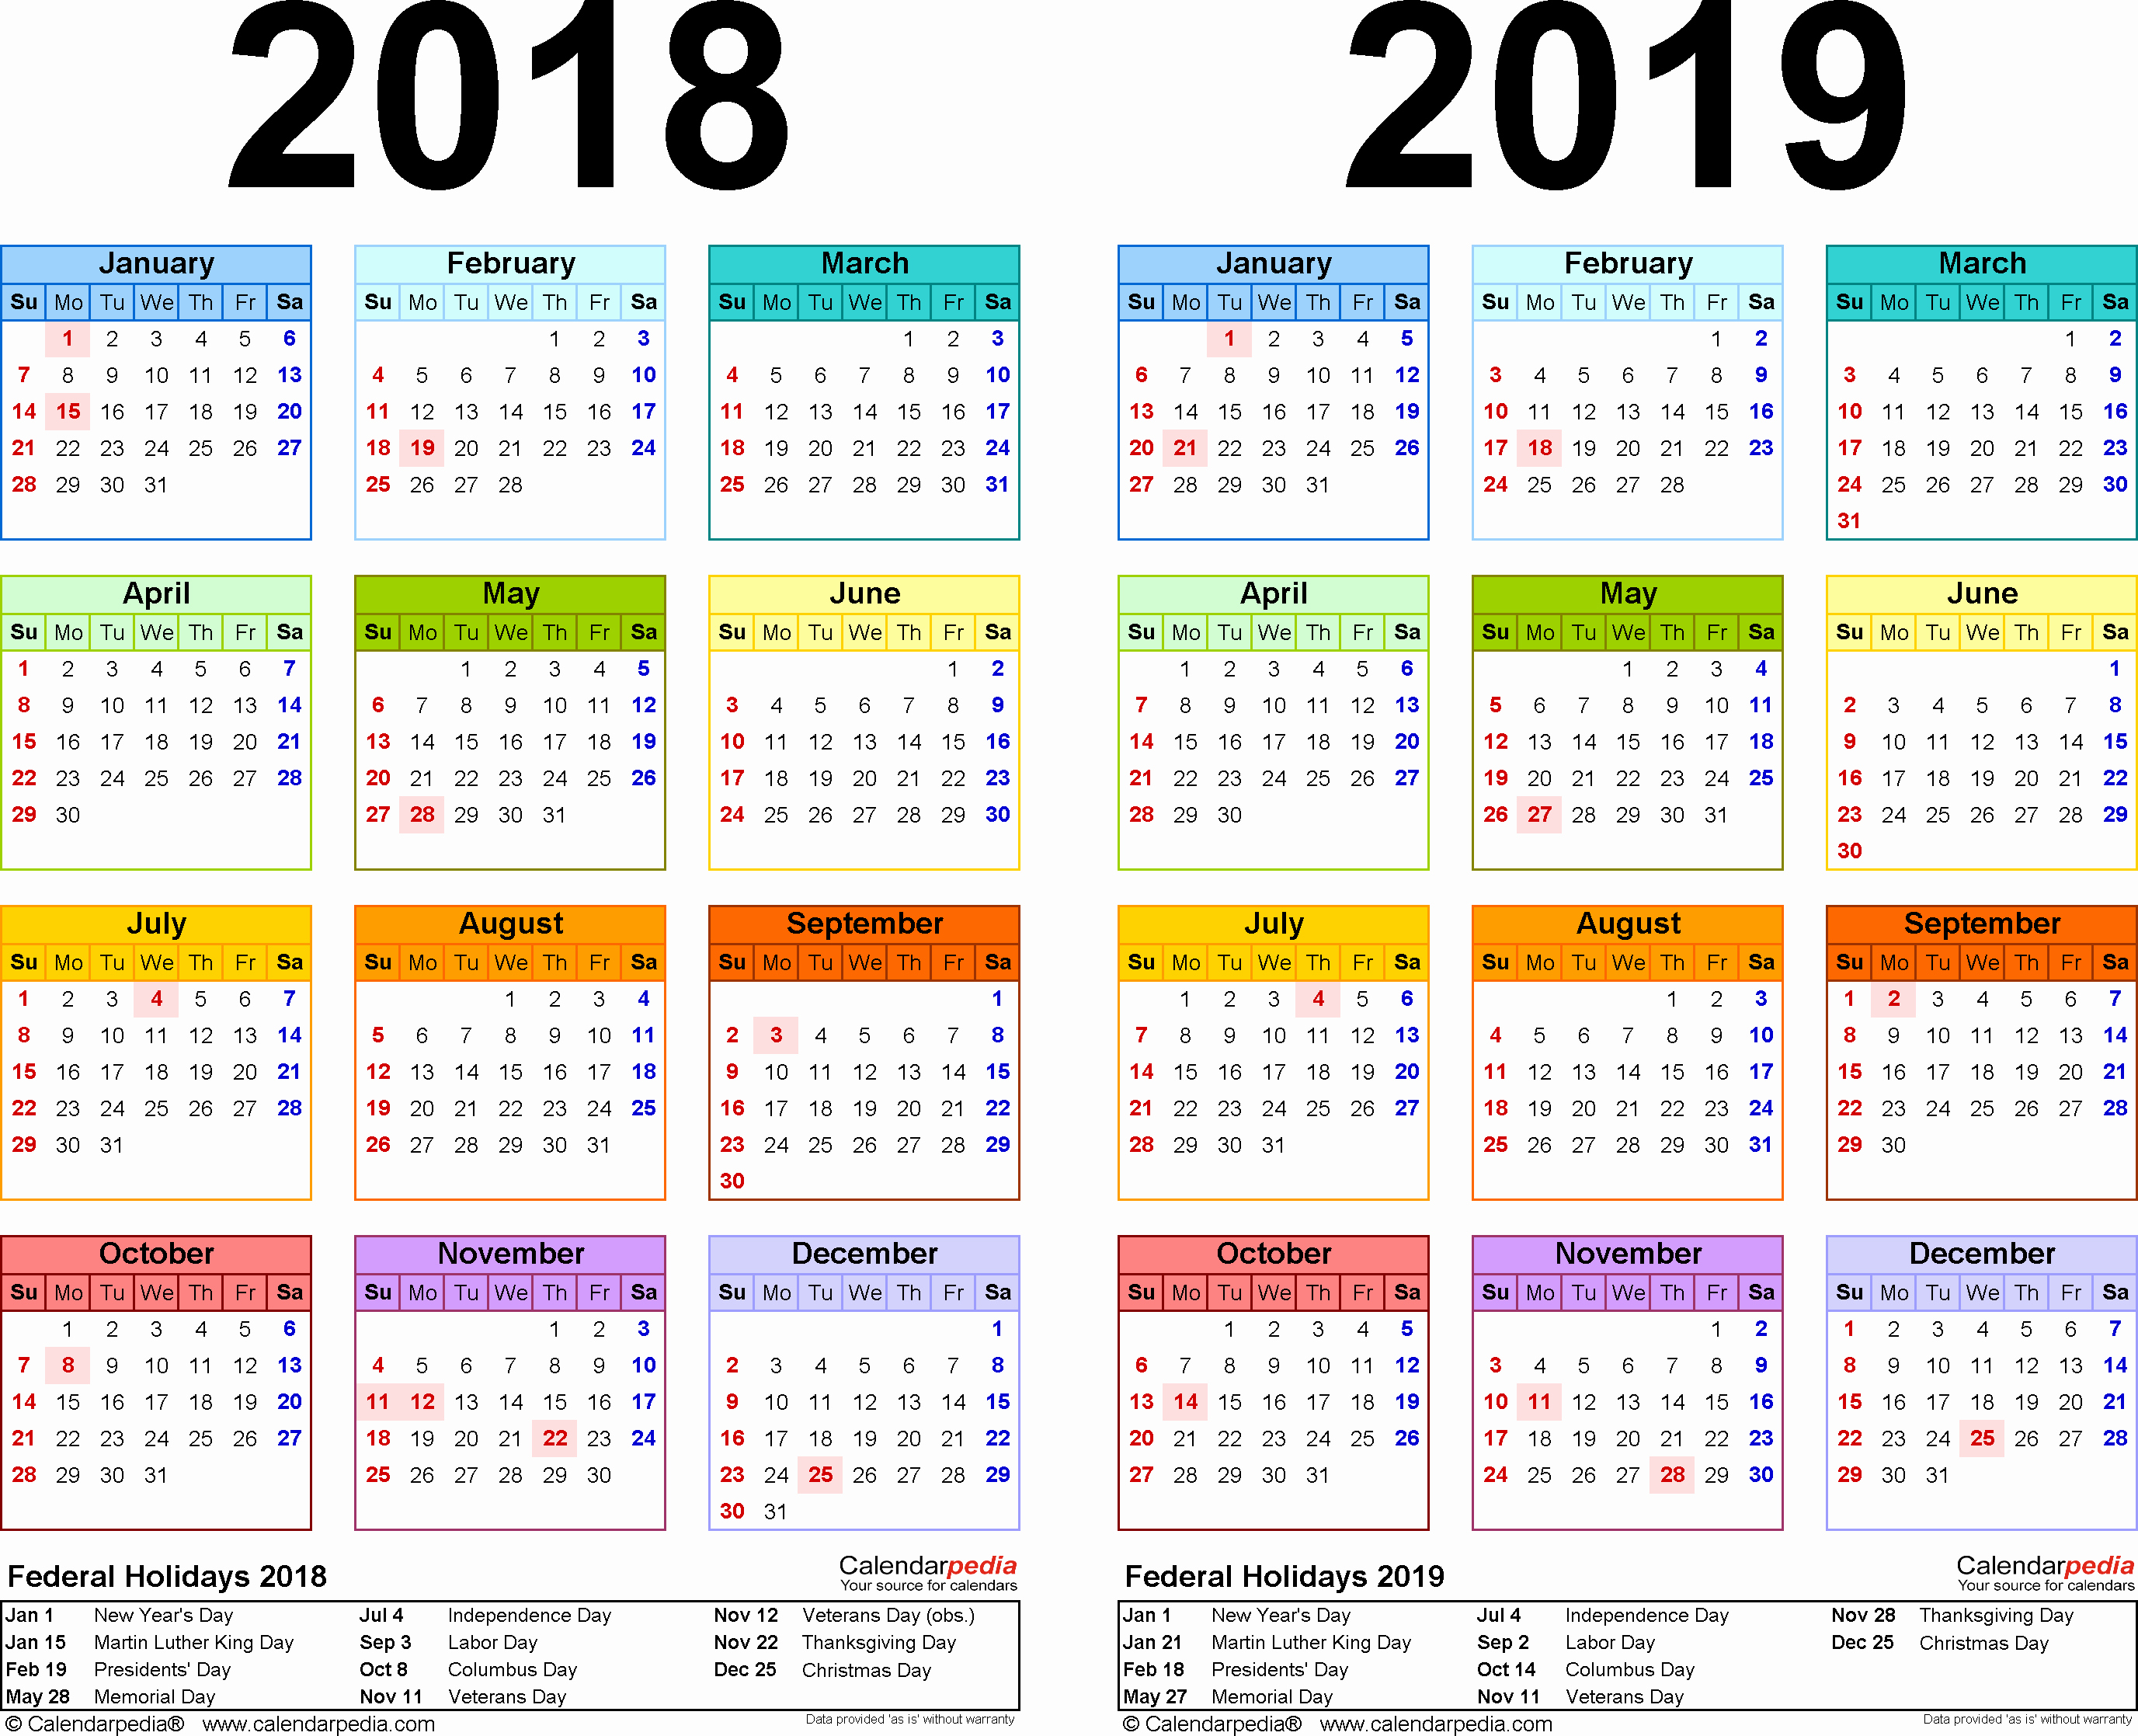 Printable 2018 and 2019 Calendar Fresh 2018 2019 Calendar Free Printable Two Year Pdf Calendars